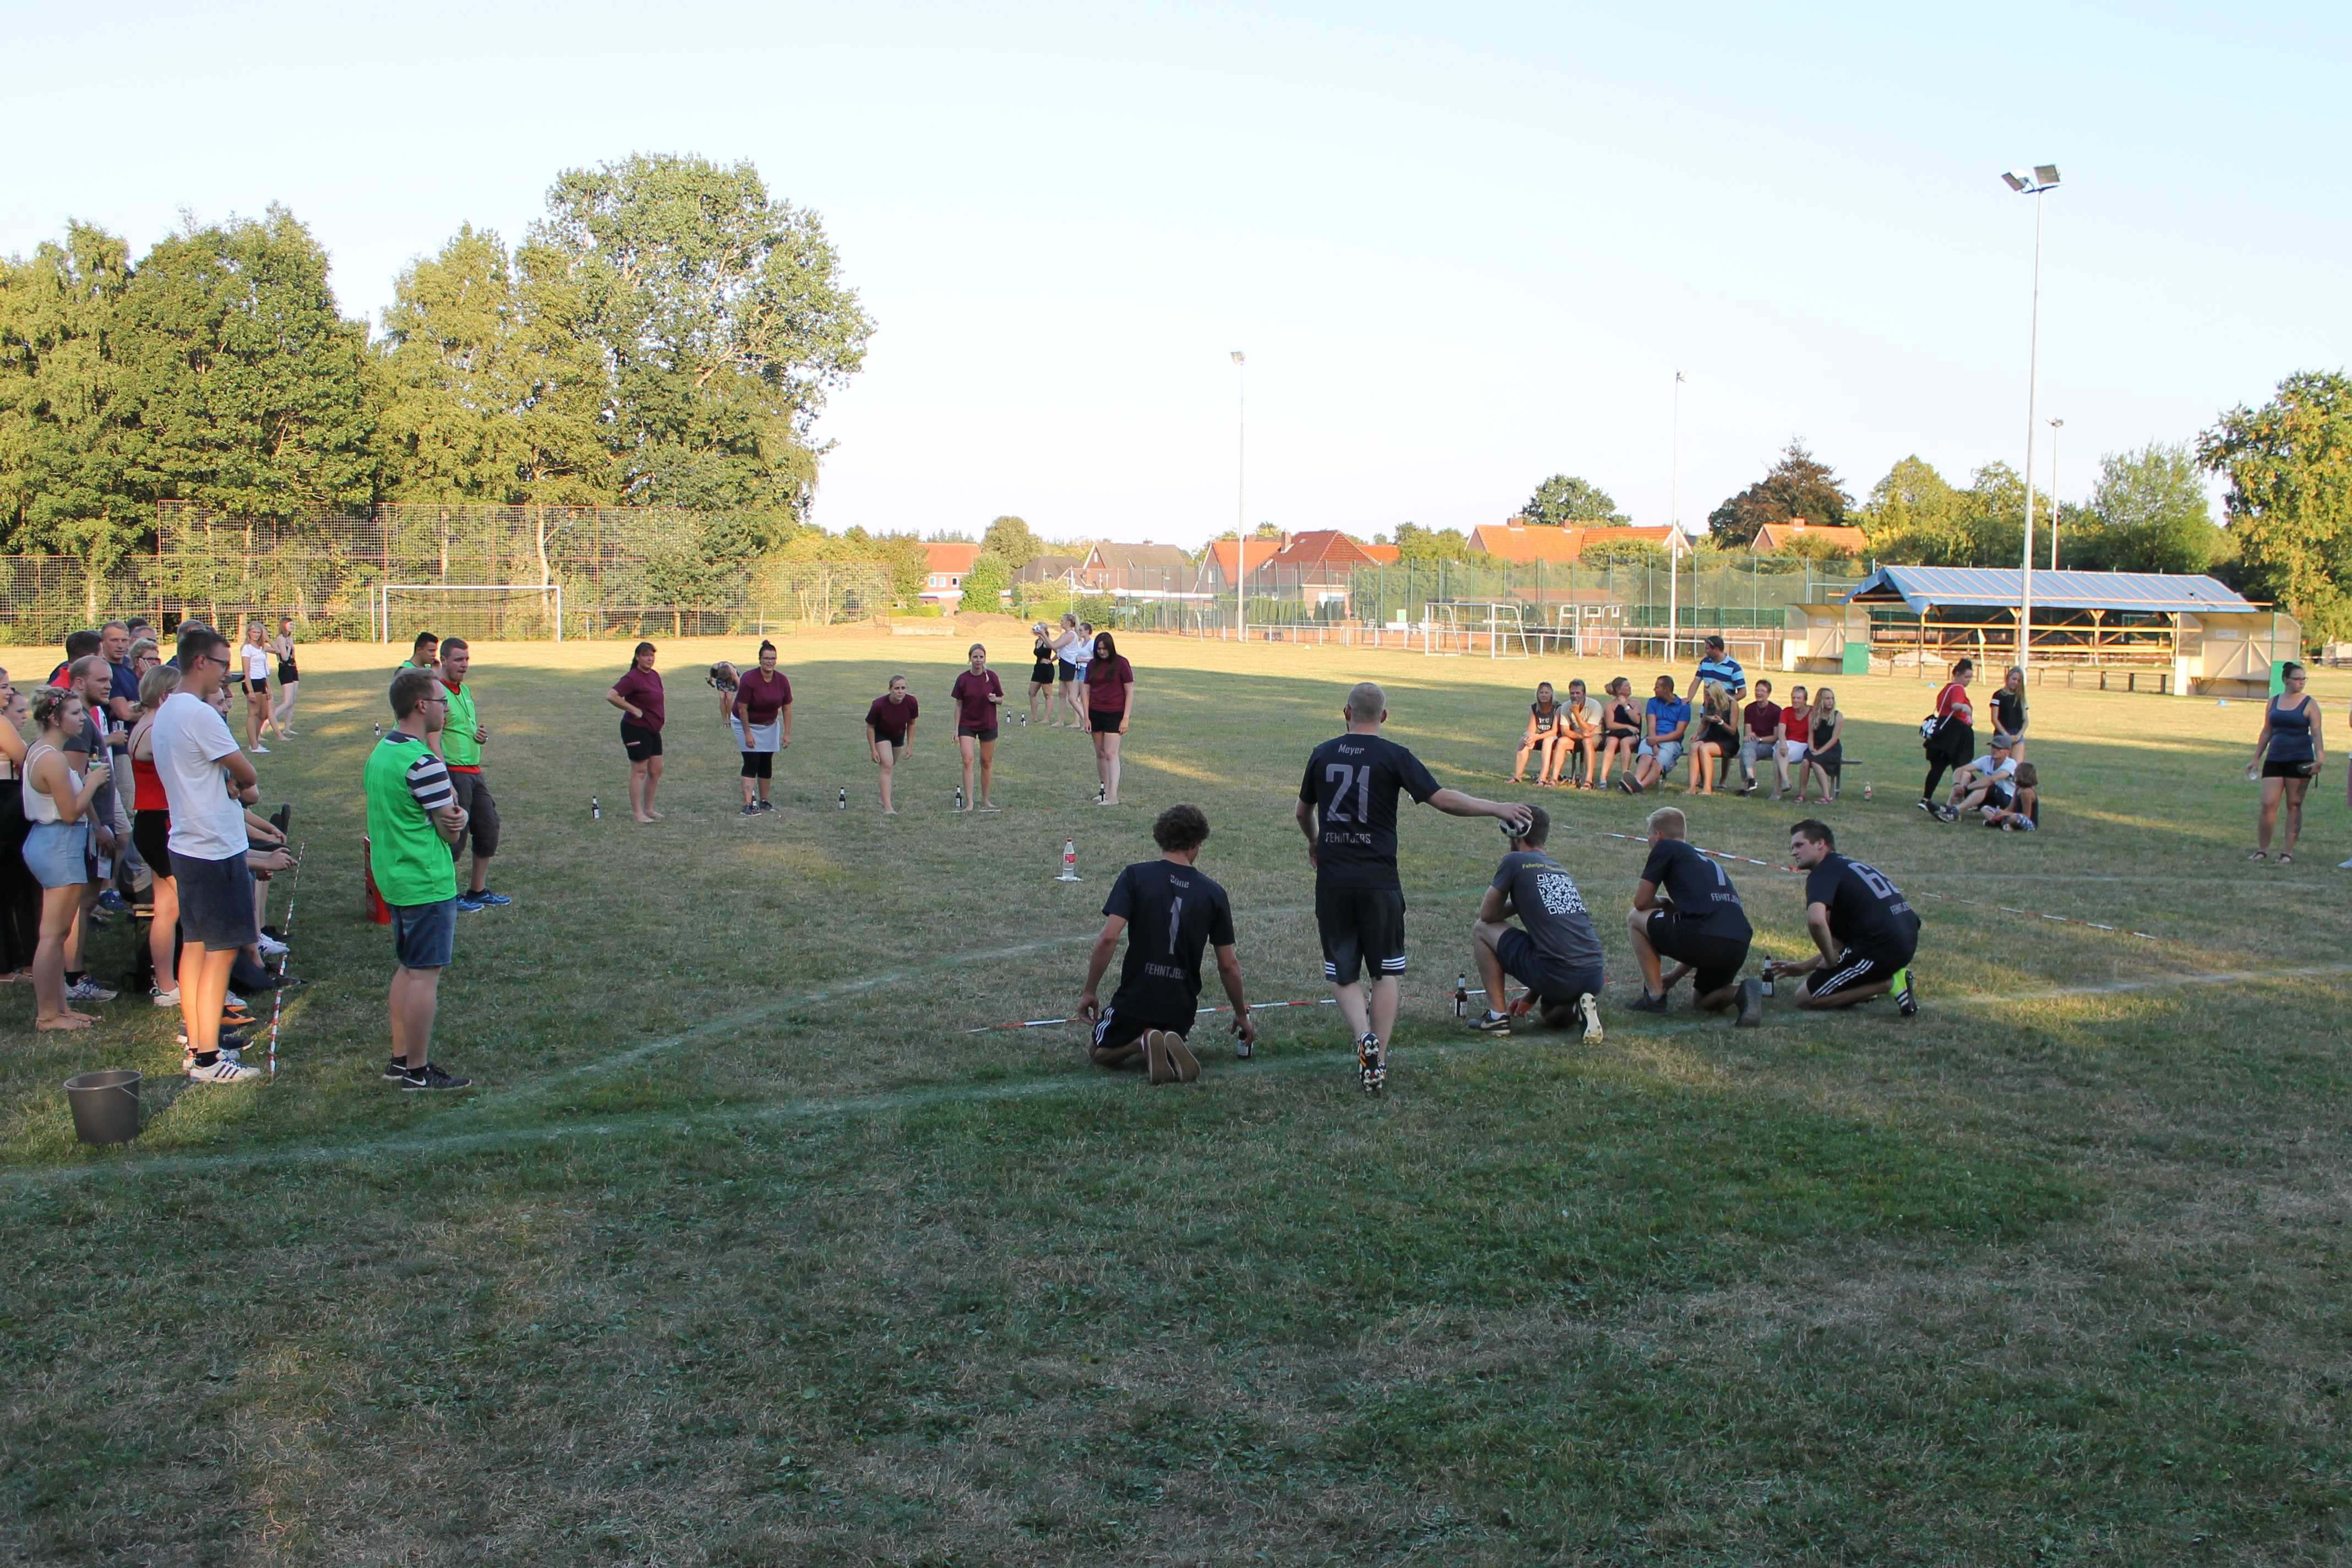 2018-07-27 Sportwoche - Flunkyball Turnier (45)